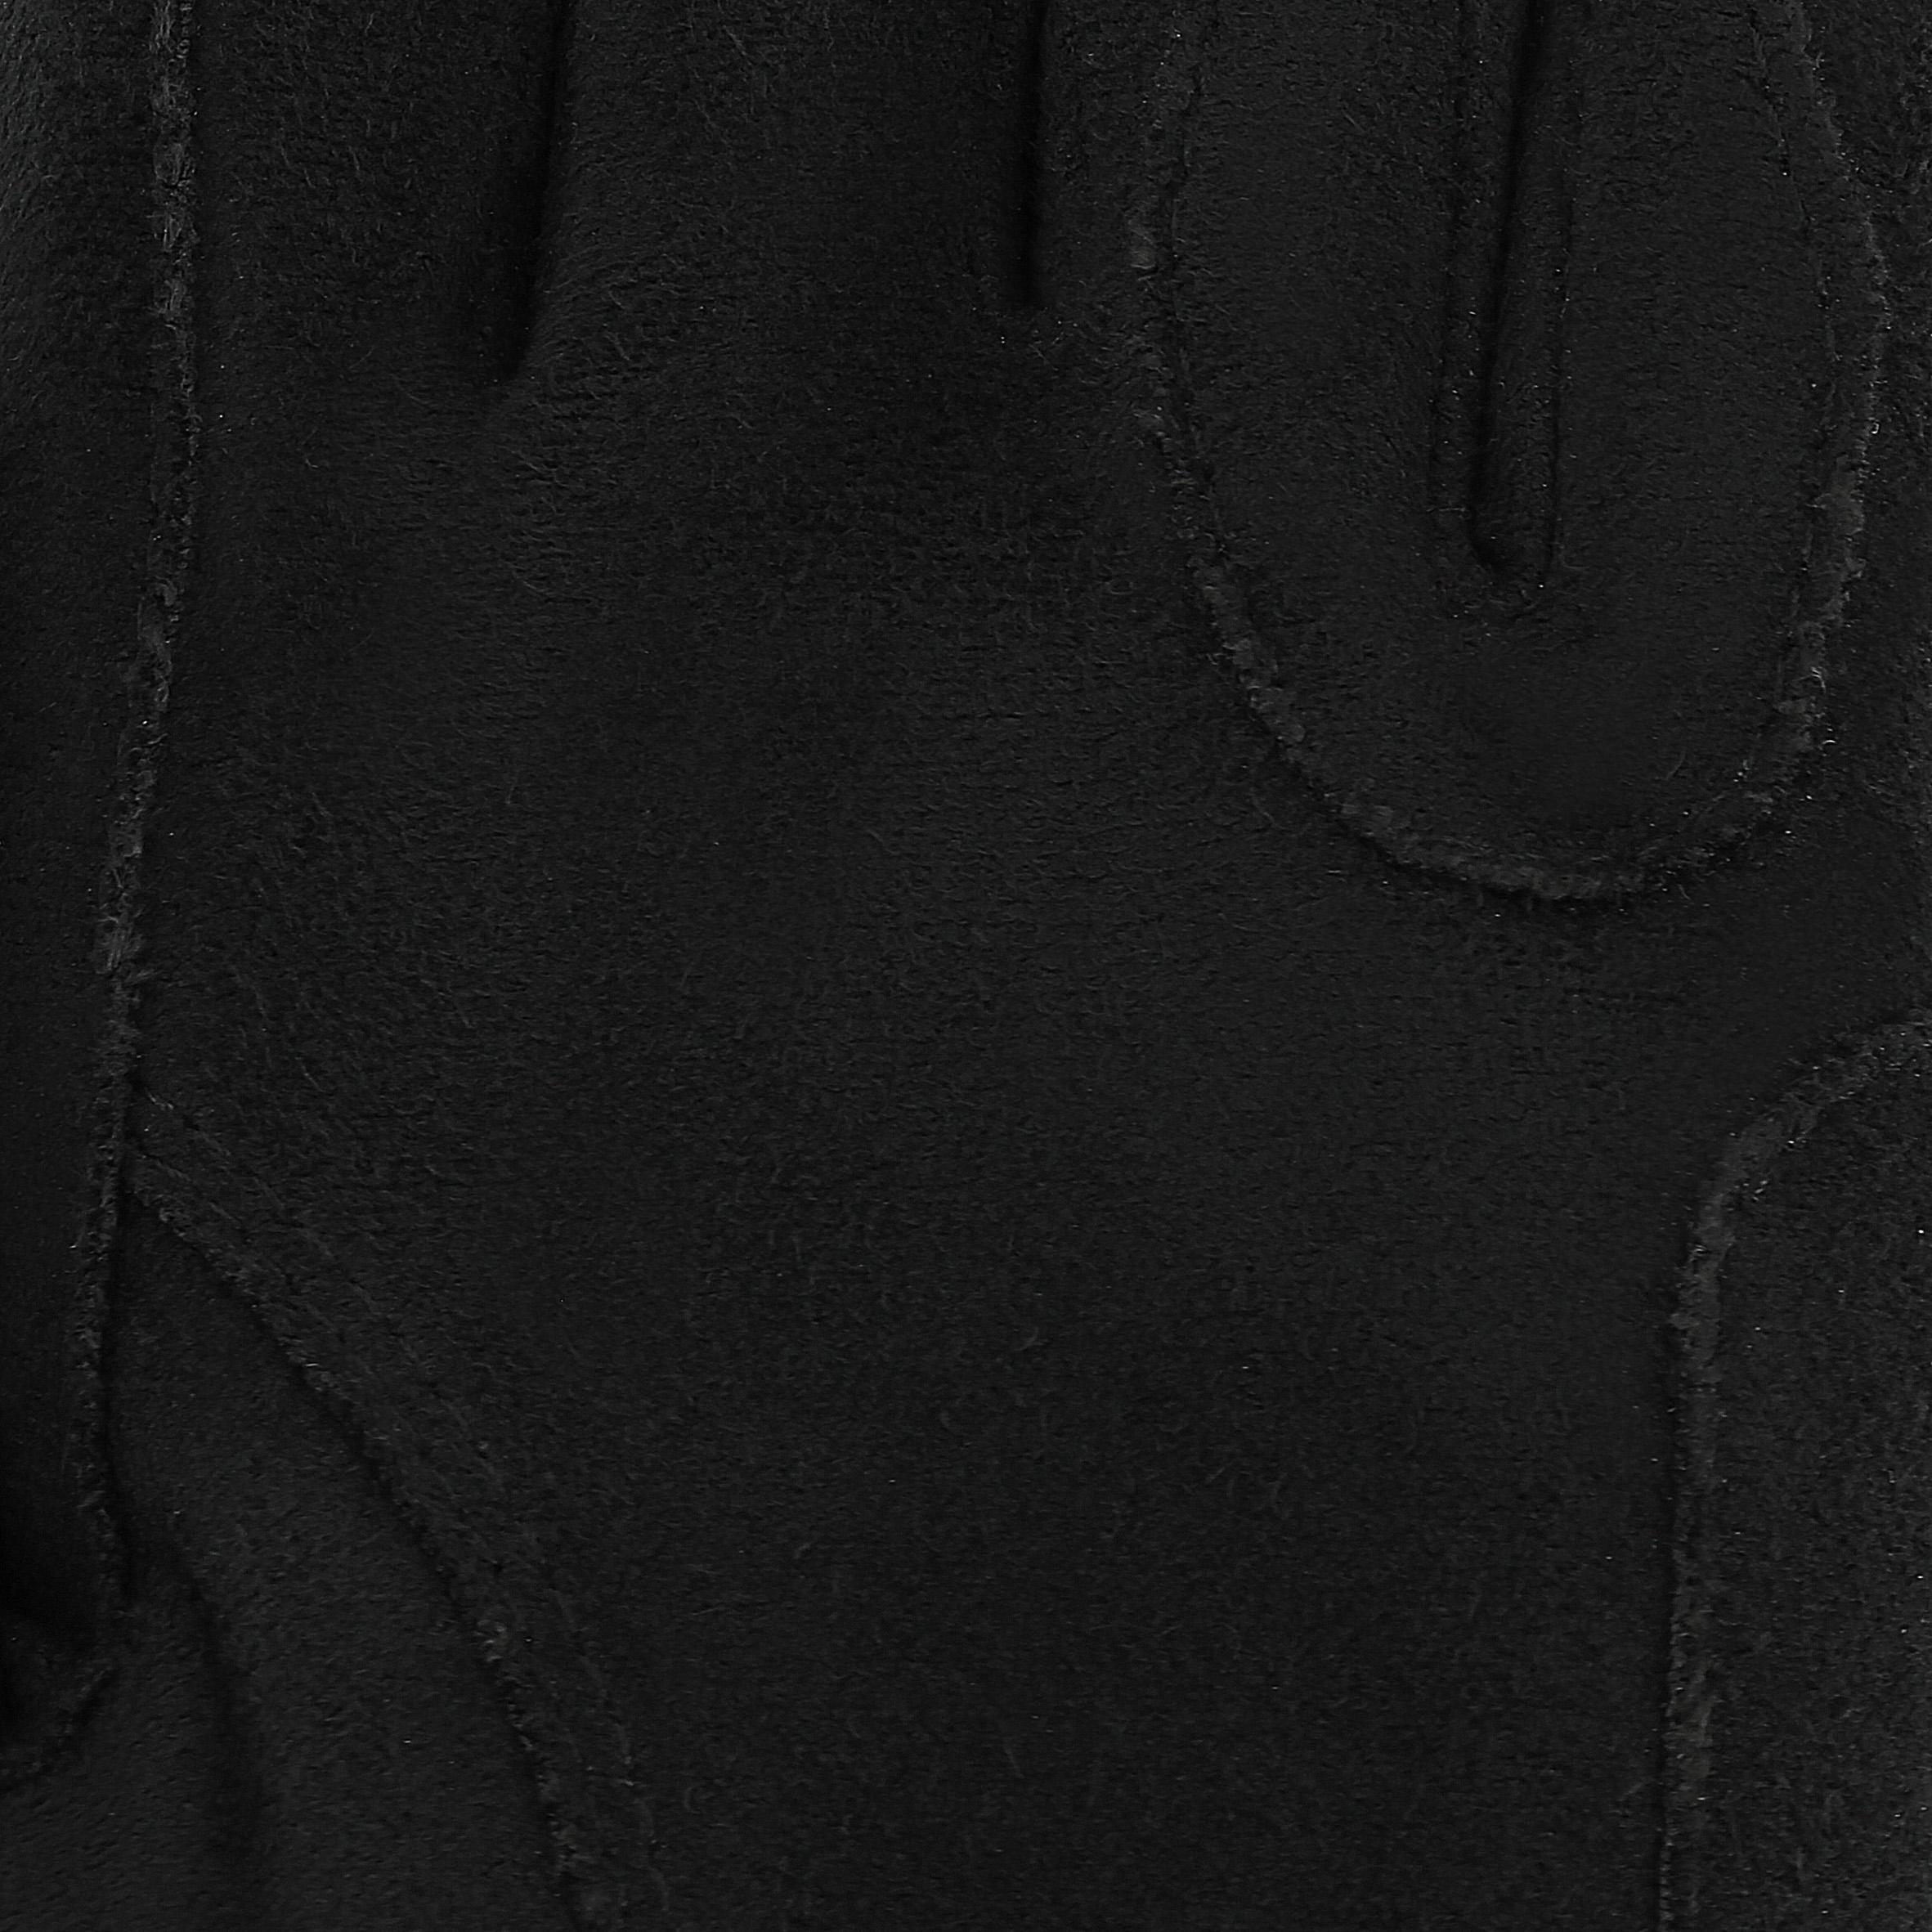 Kipwarm Adult Horseback Riding Gloves - Black